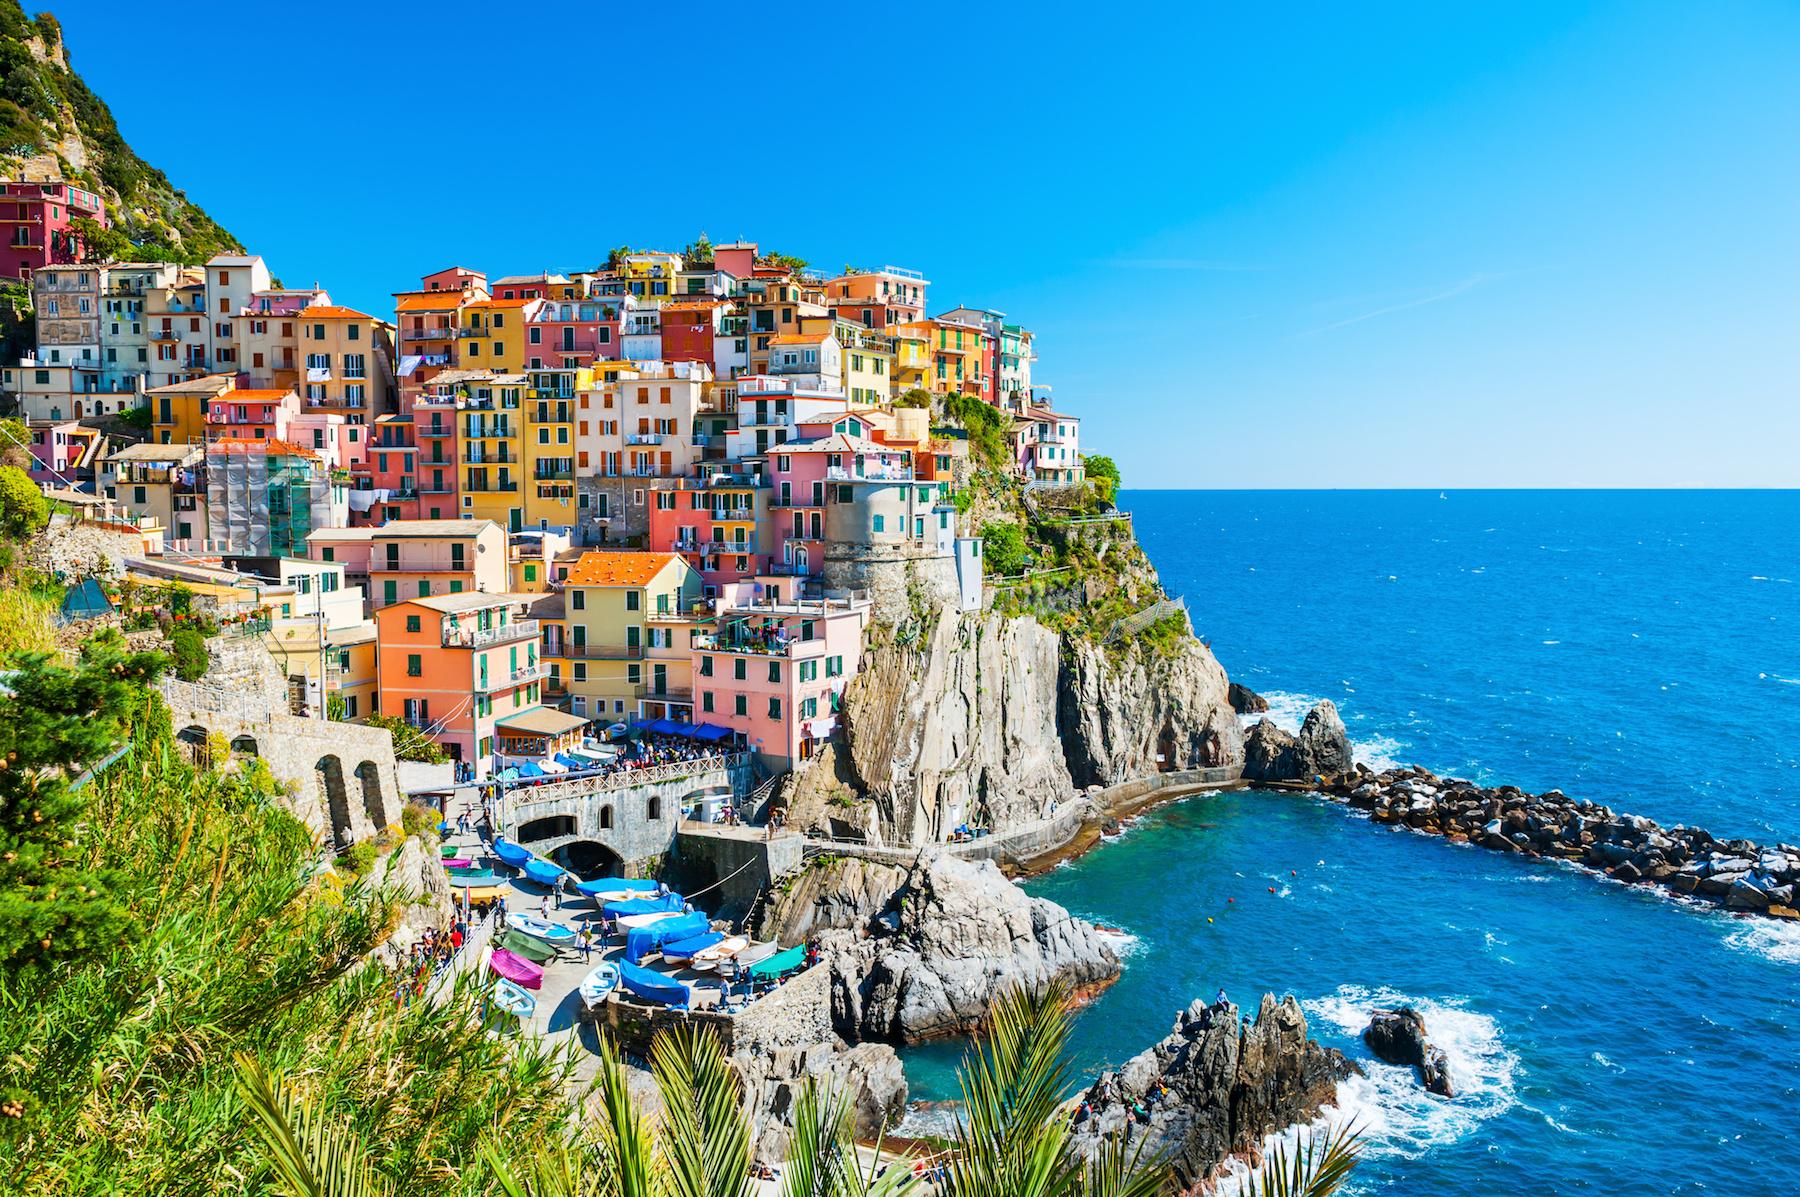 Sailing Italy - Boating Holidays in Italy. | YACHTICO.com